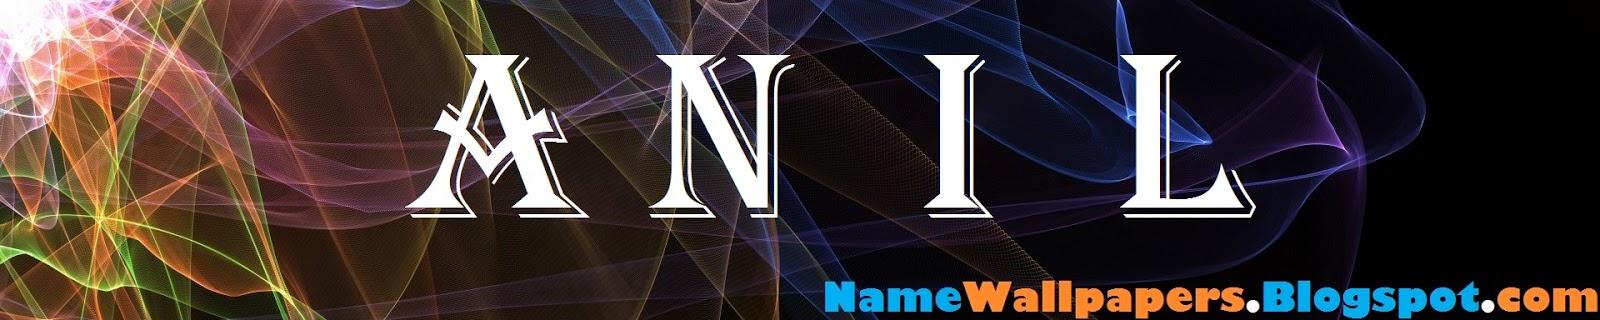 Wallpaper Name Anil Impremedia Net